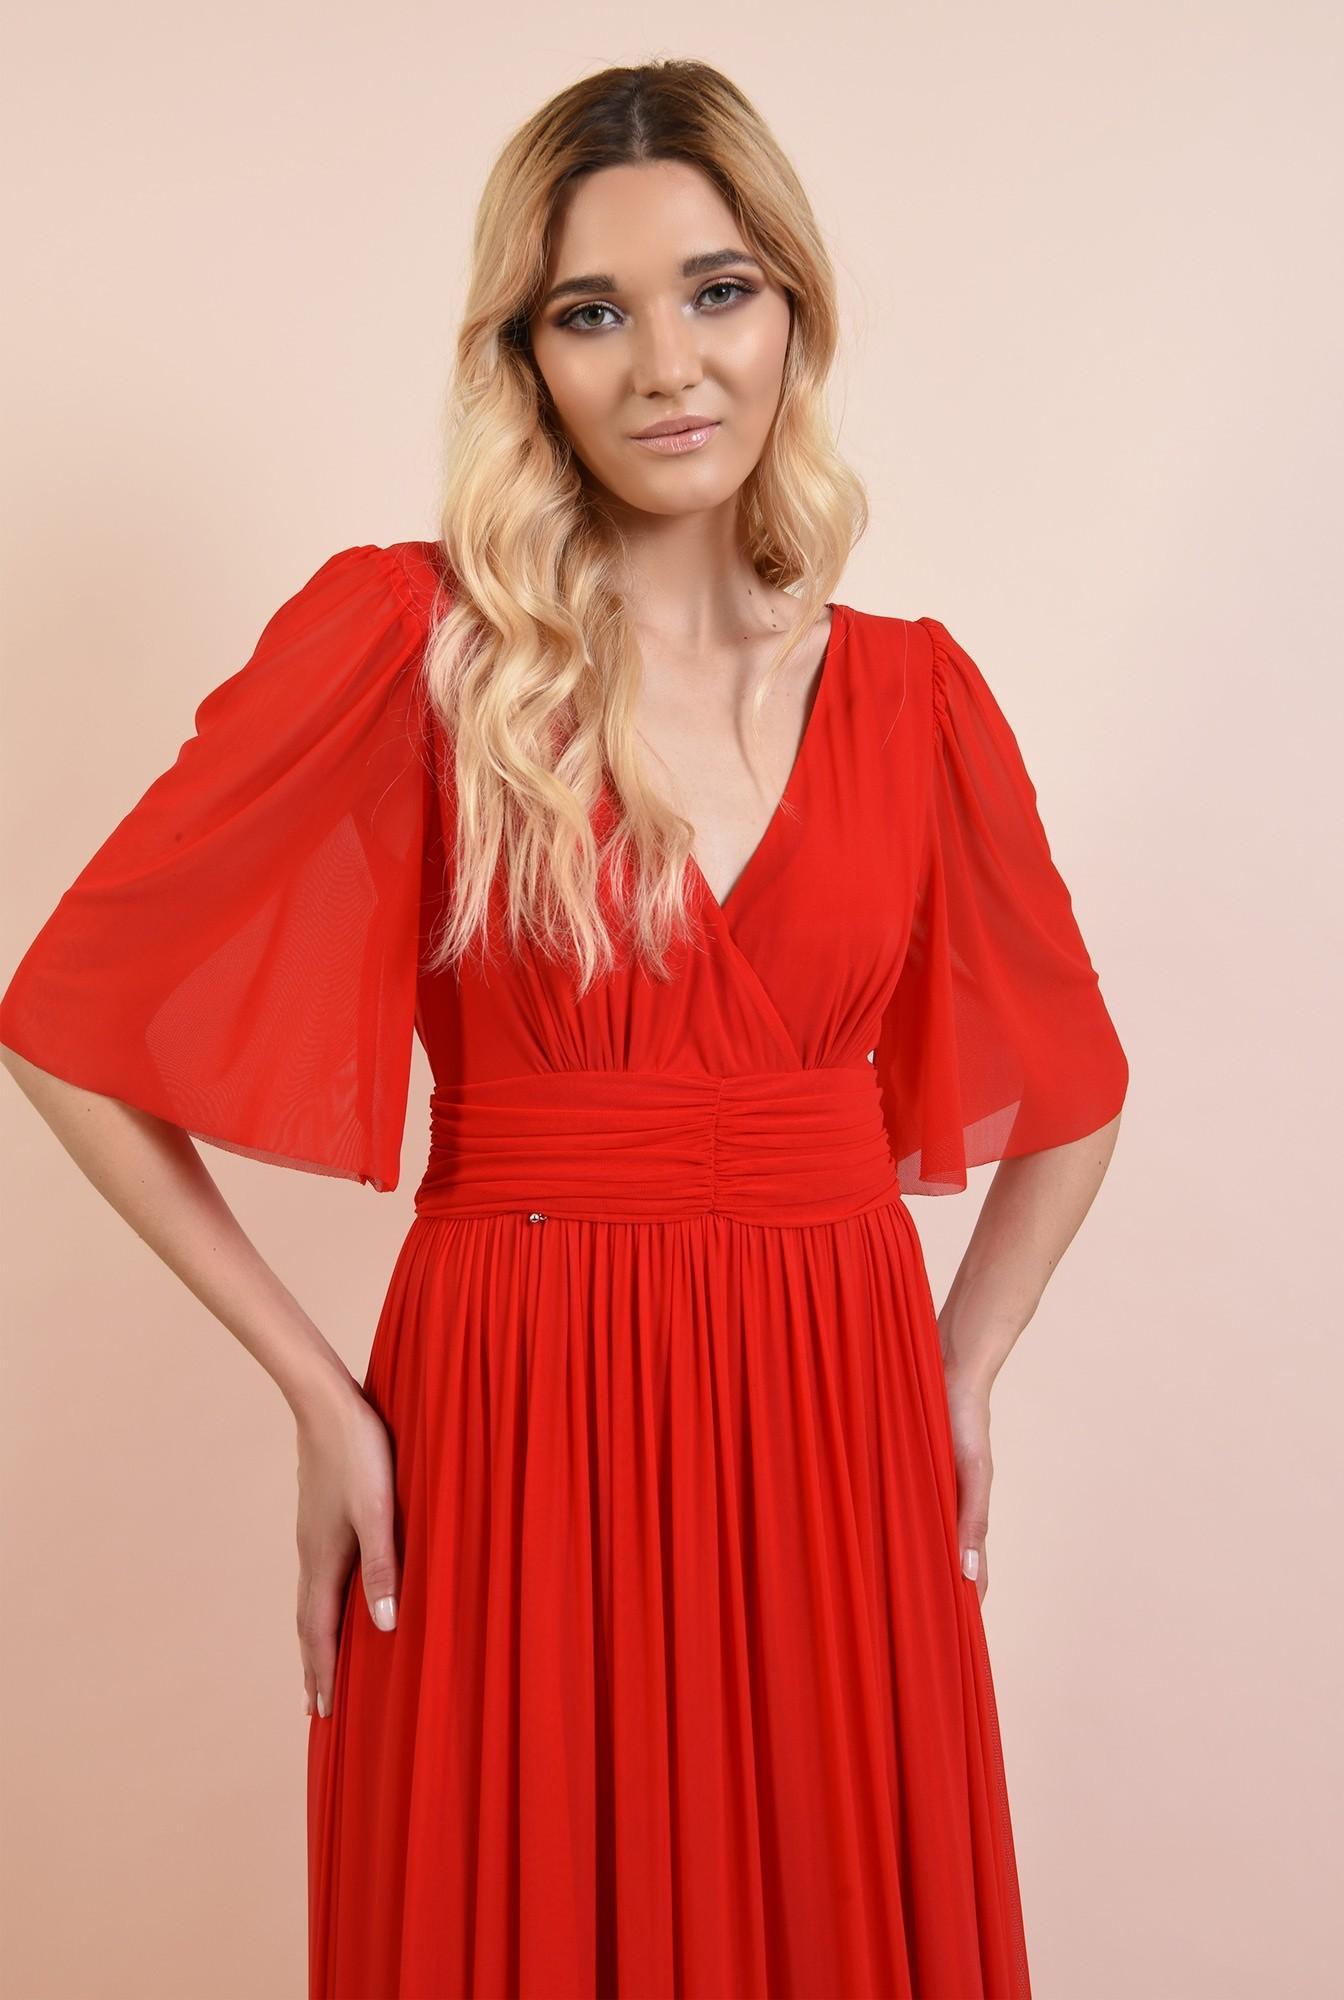 2 - rochie rosie, lunga, de seara, anchior, evazata, maneci fluture, Poema